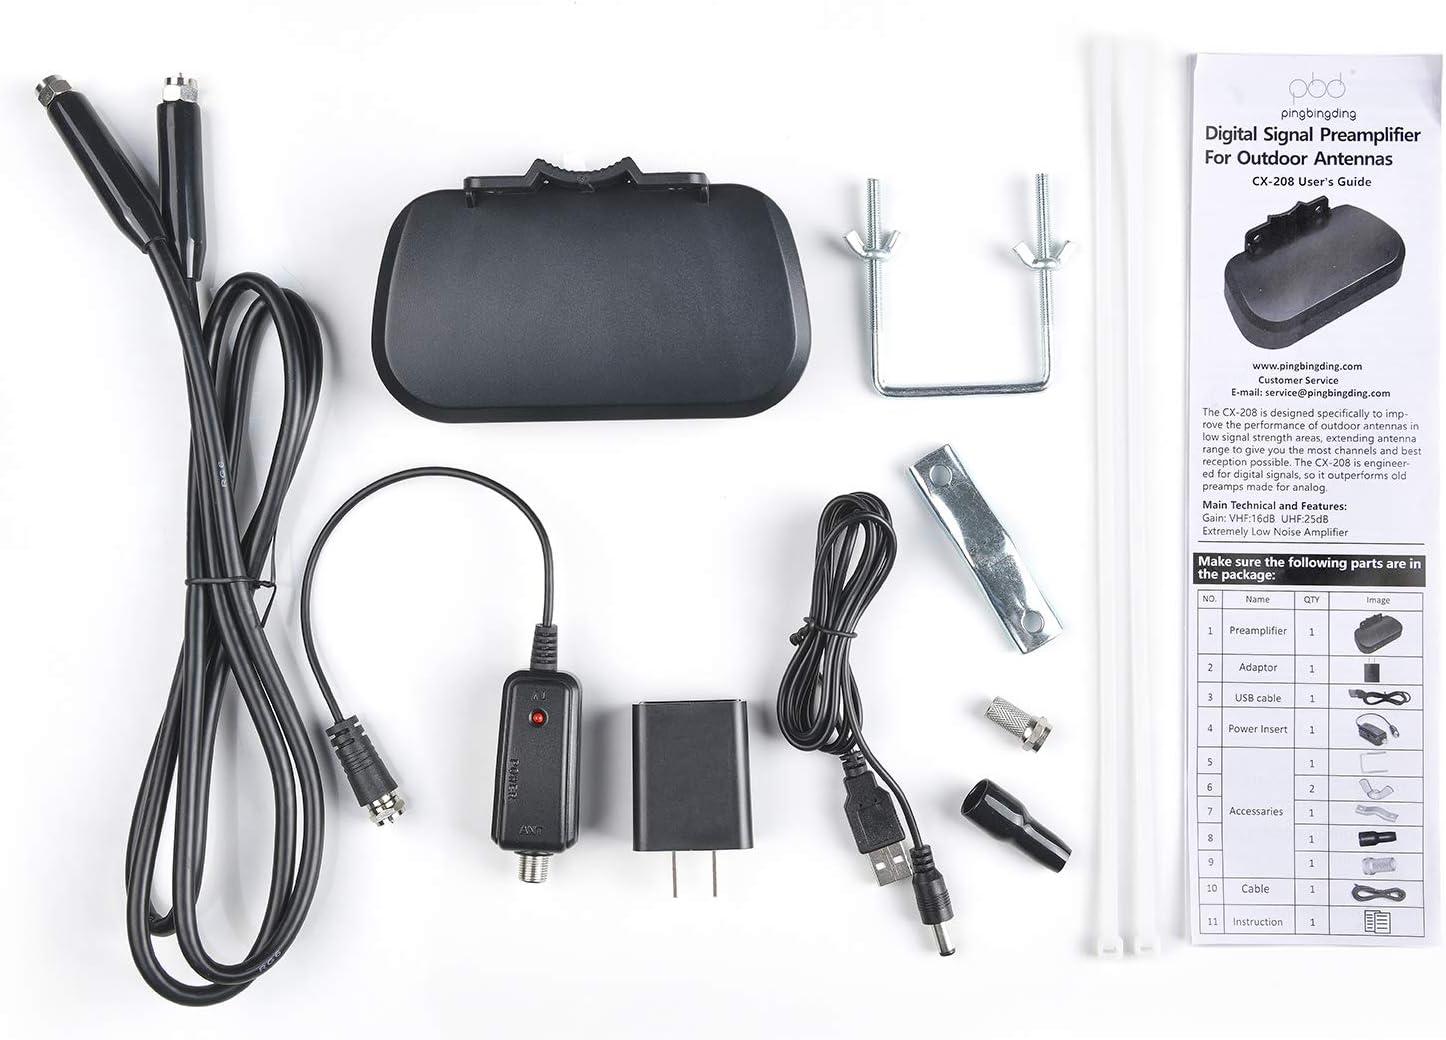 HD Digital VHF UHF Amplifier TV Antenna Amplifier Signal Booster pingbingding HDTV Preamplifier